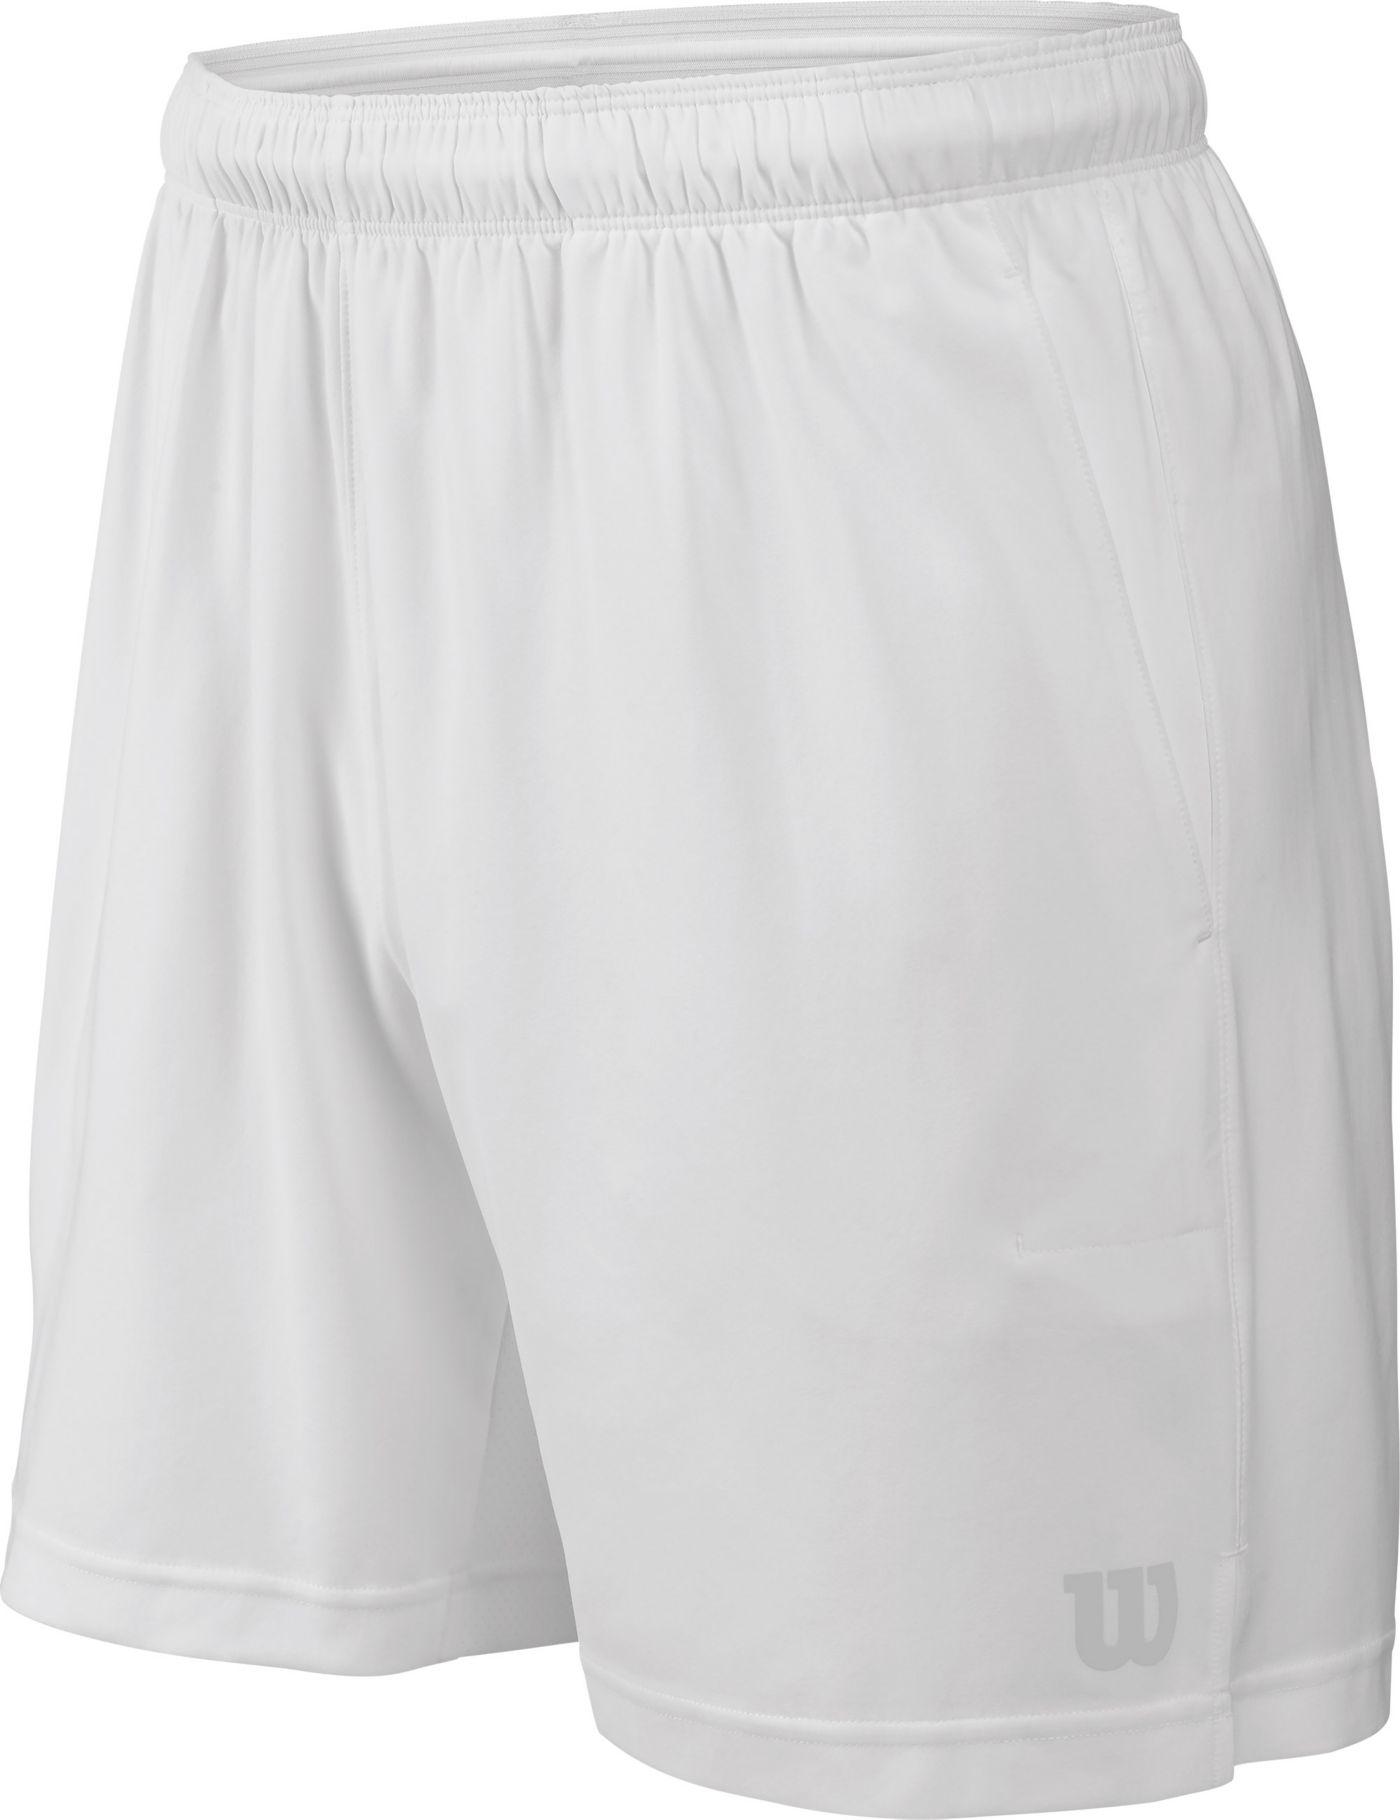 "Wilson Men's Rush 9"" Woven Tennis Shorts"